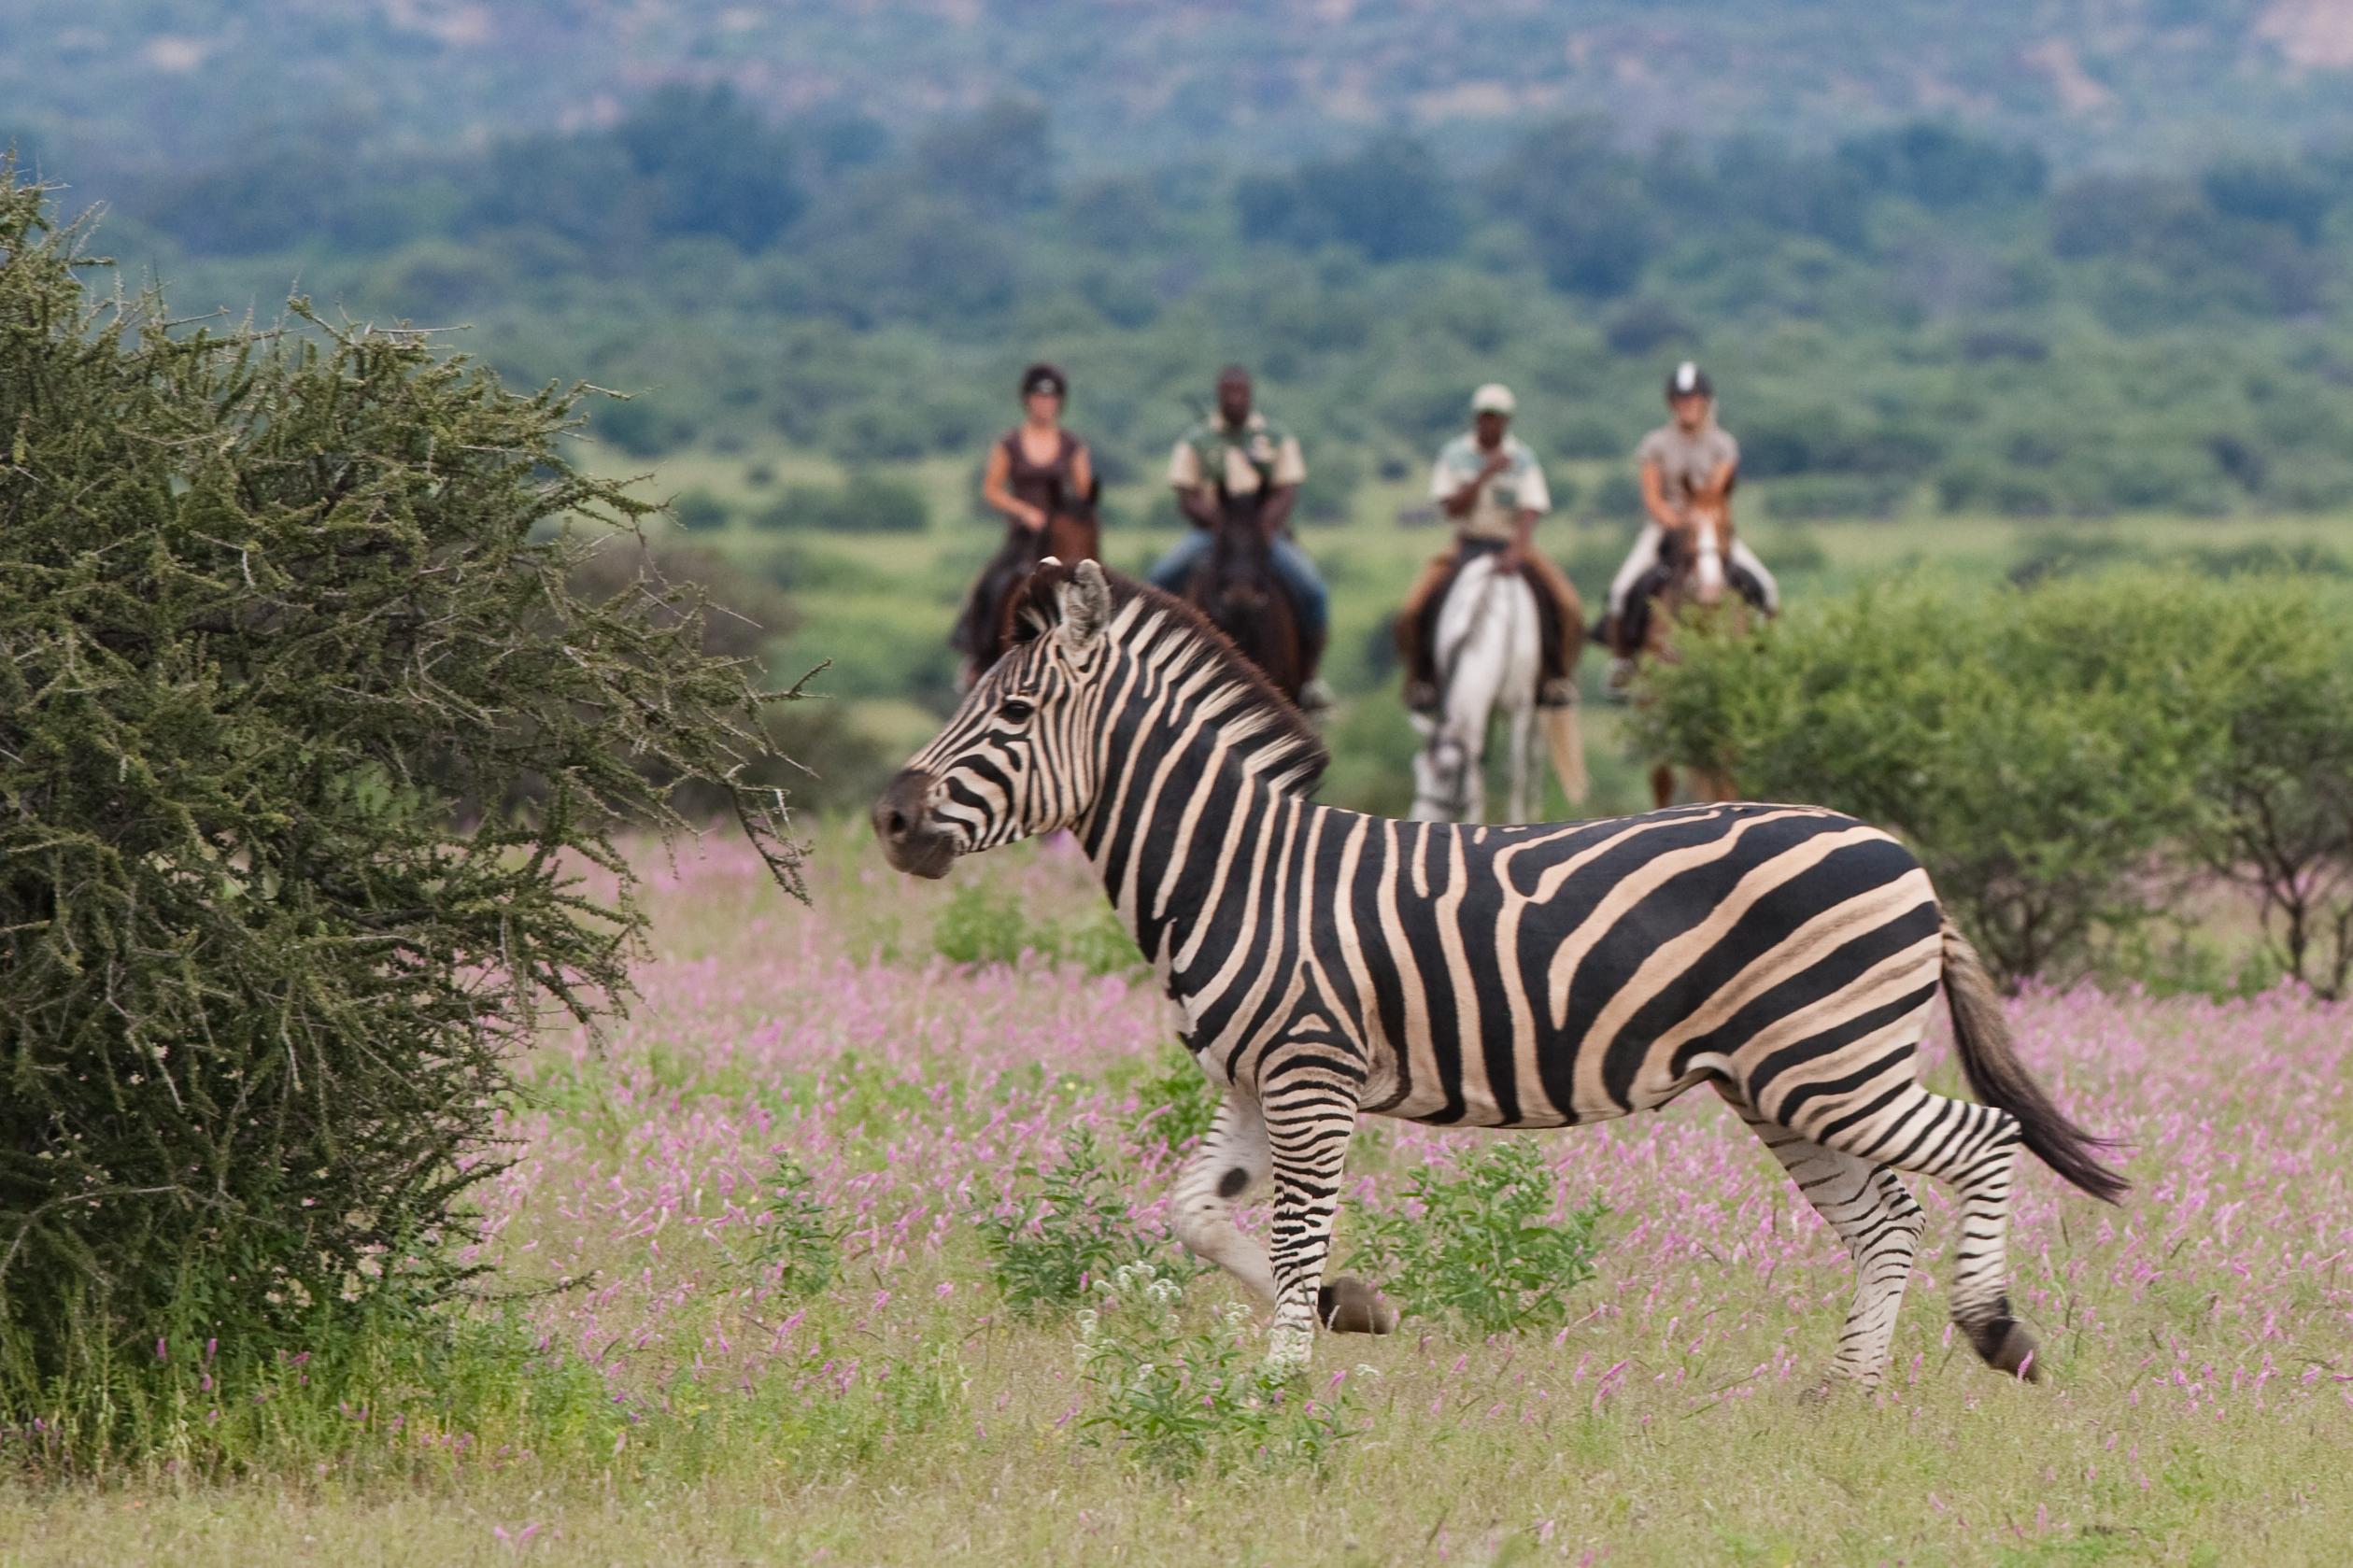 Paard ontmoet zebra in Zuid Afrika - Vakantie te paard / Reisbureau Perlan